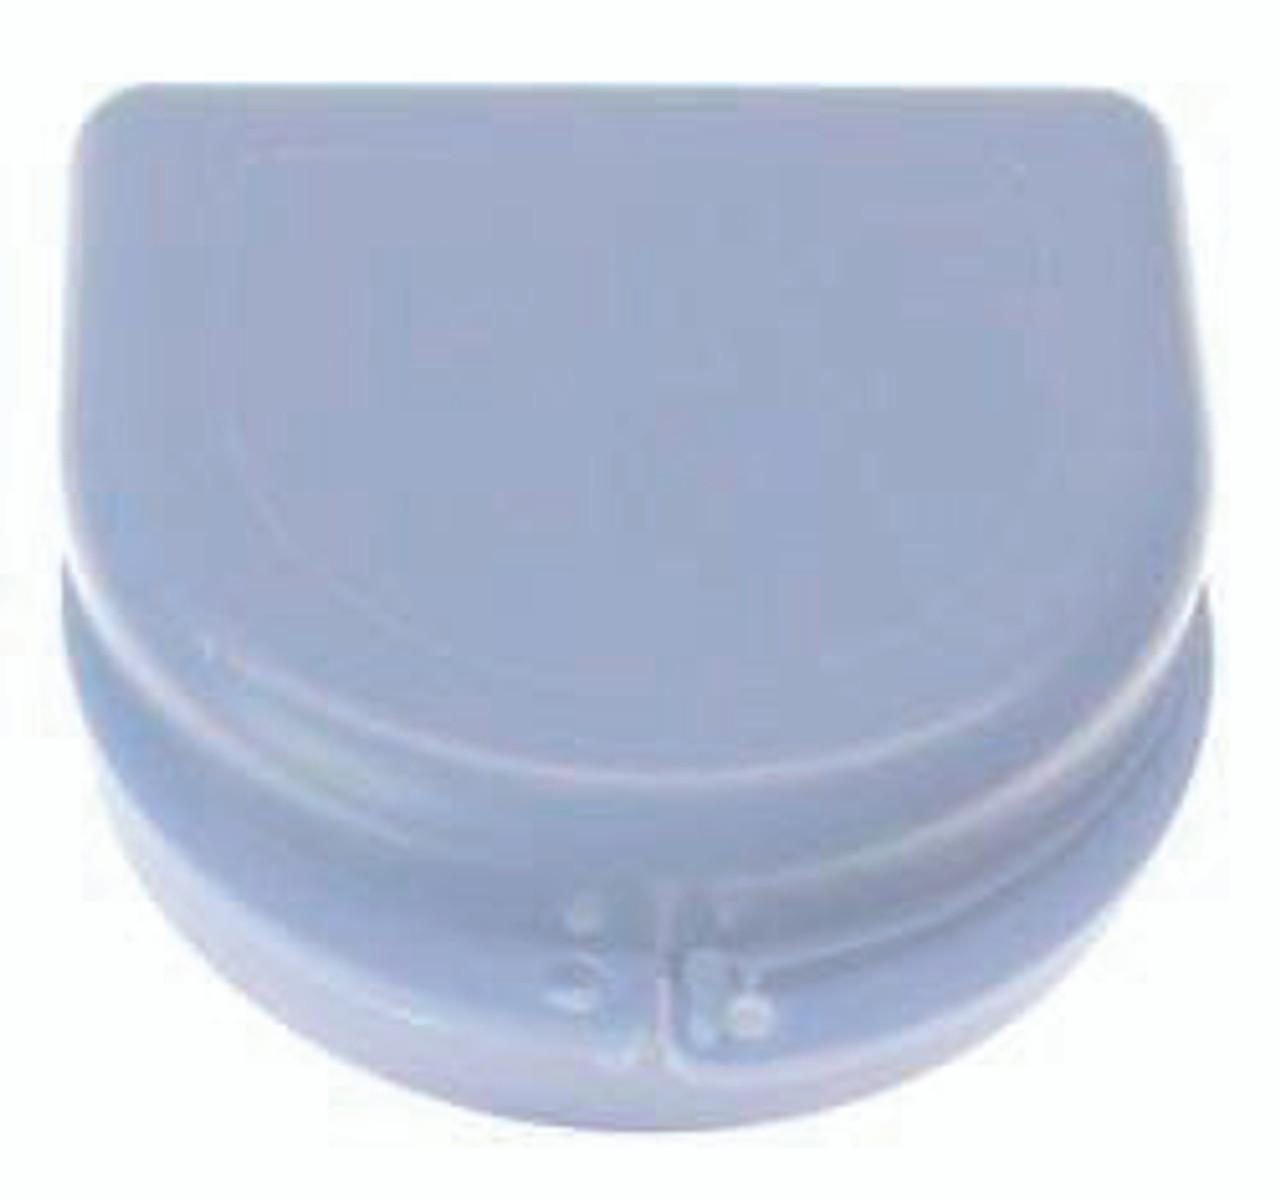 Blue Glow Retainer Cases - 25 pk